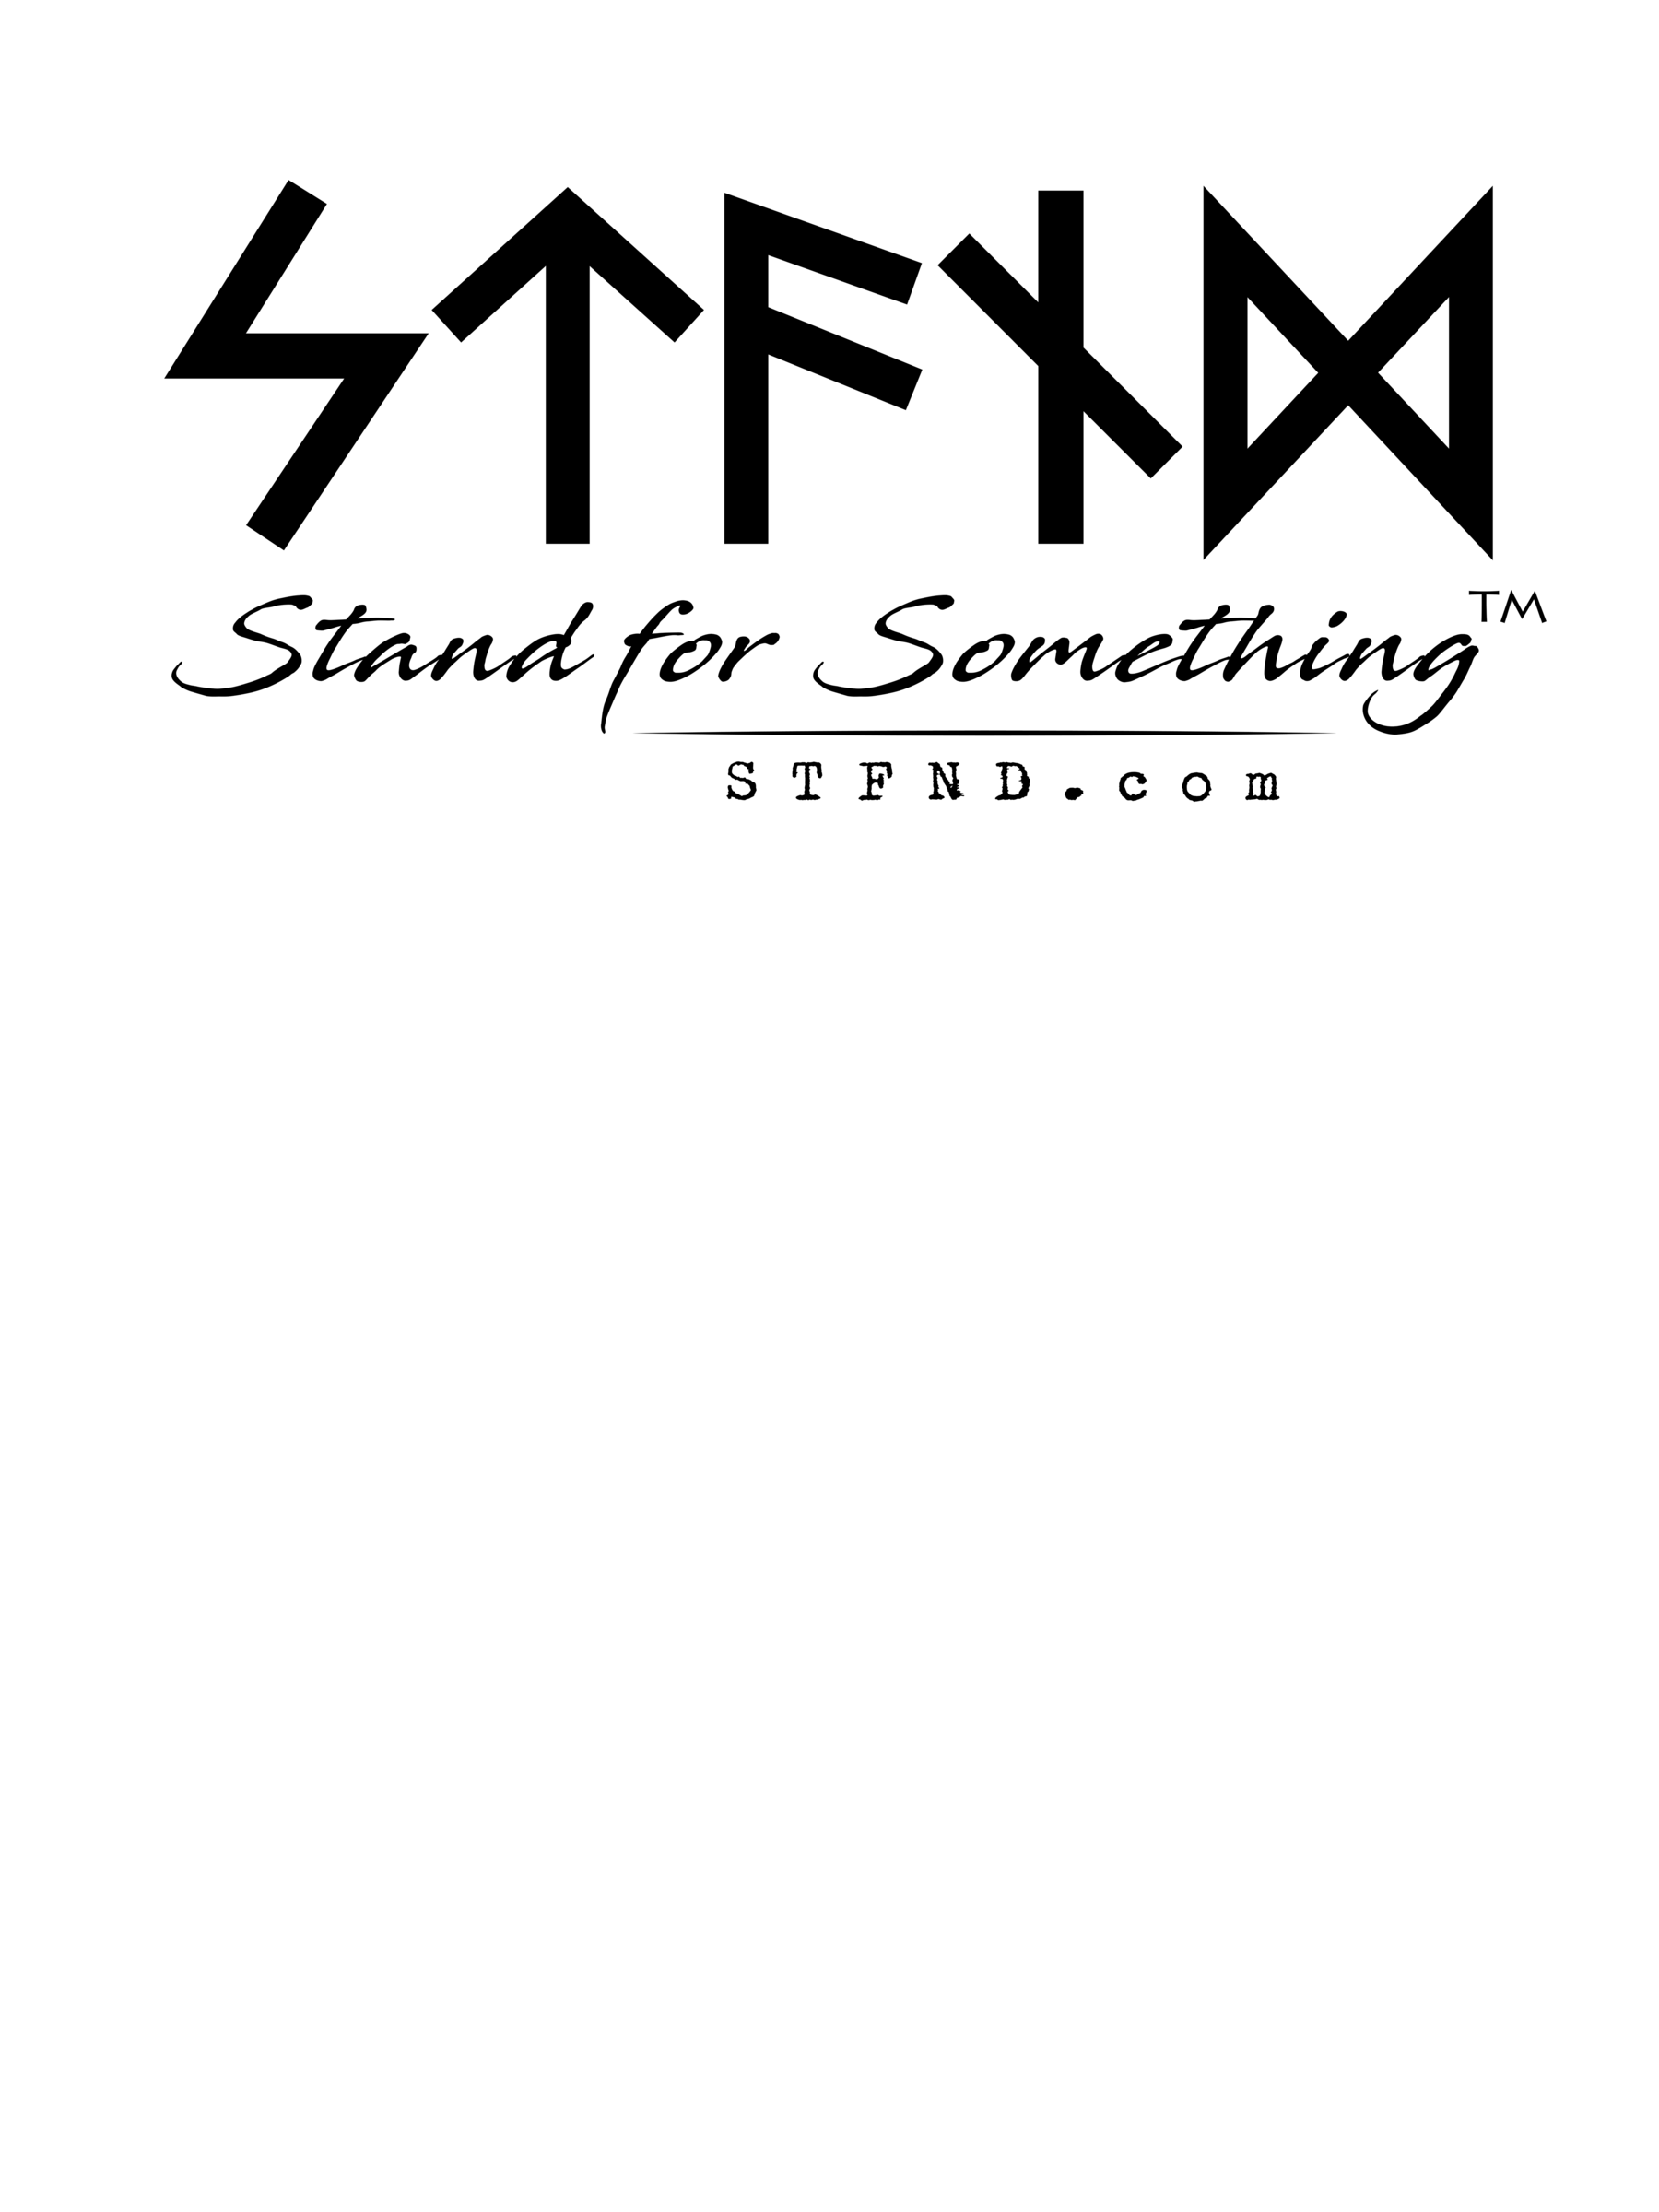 STFND